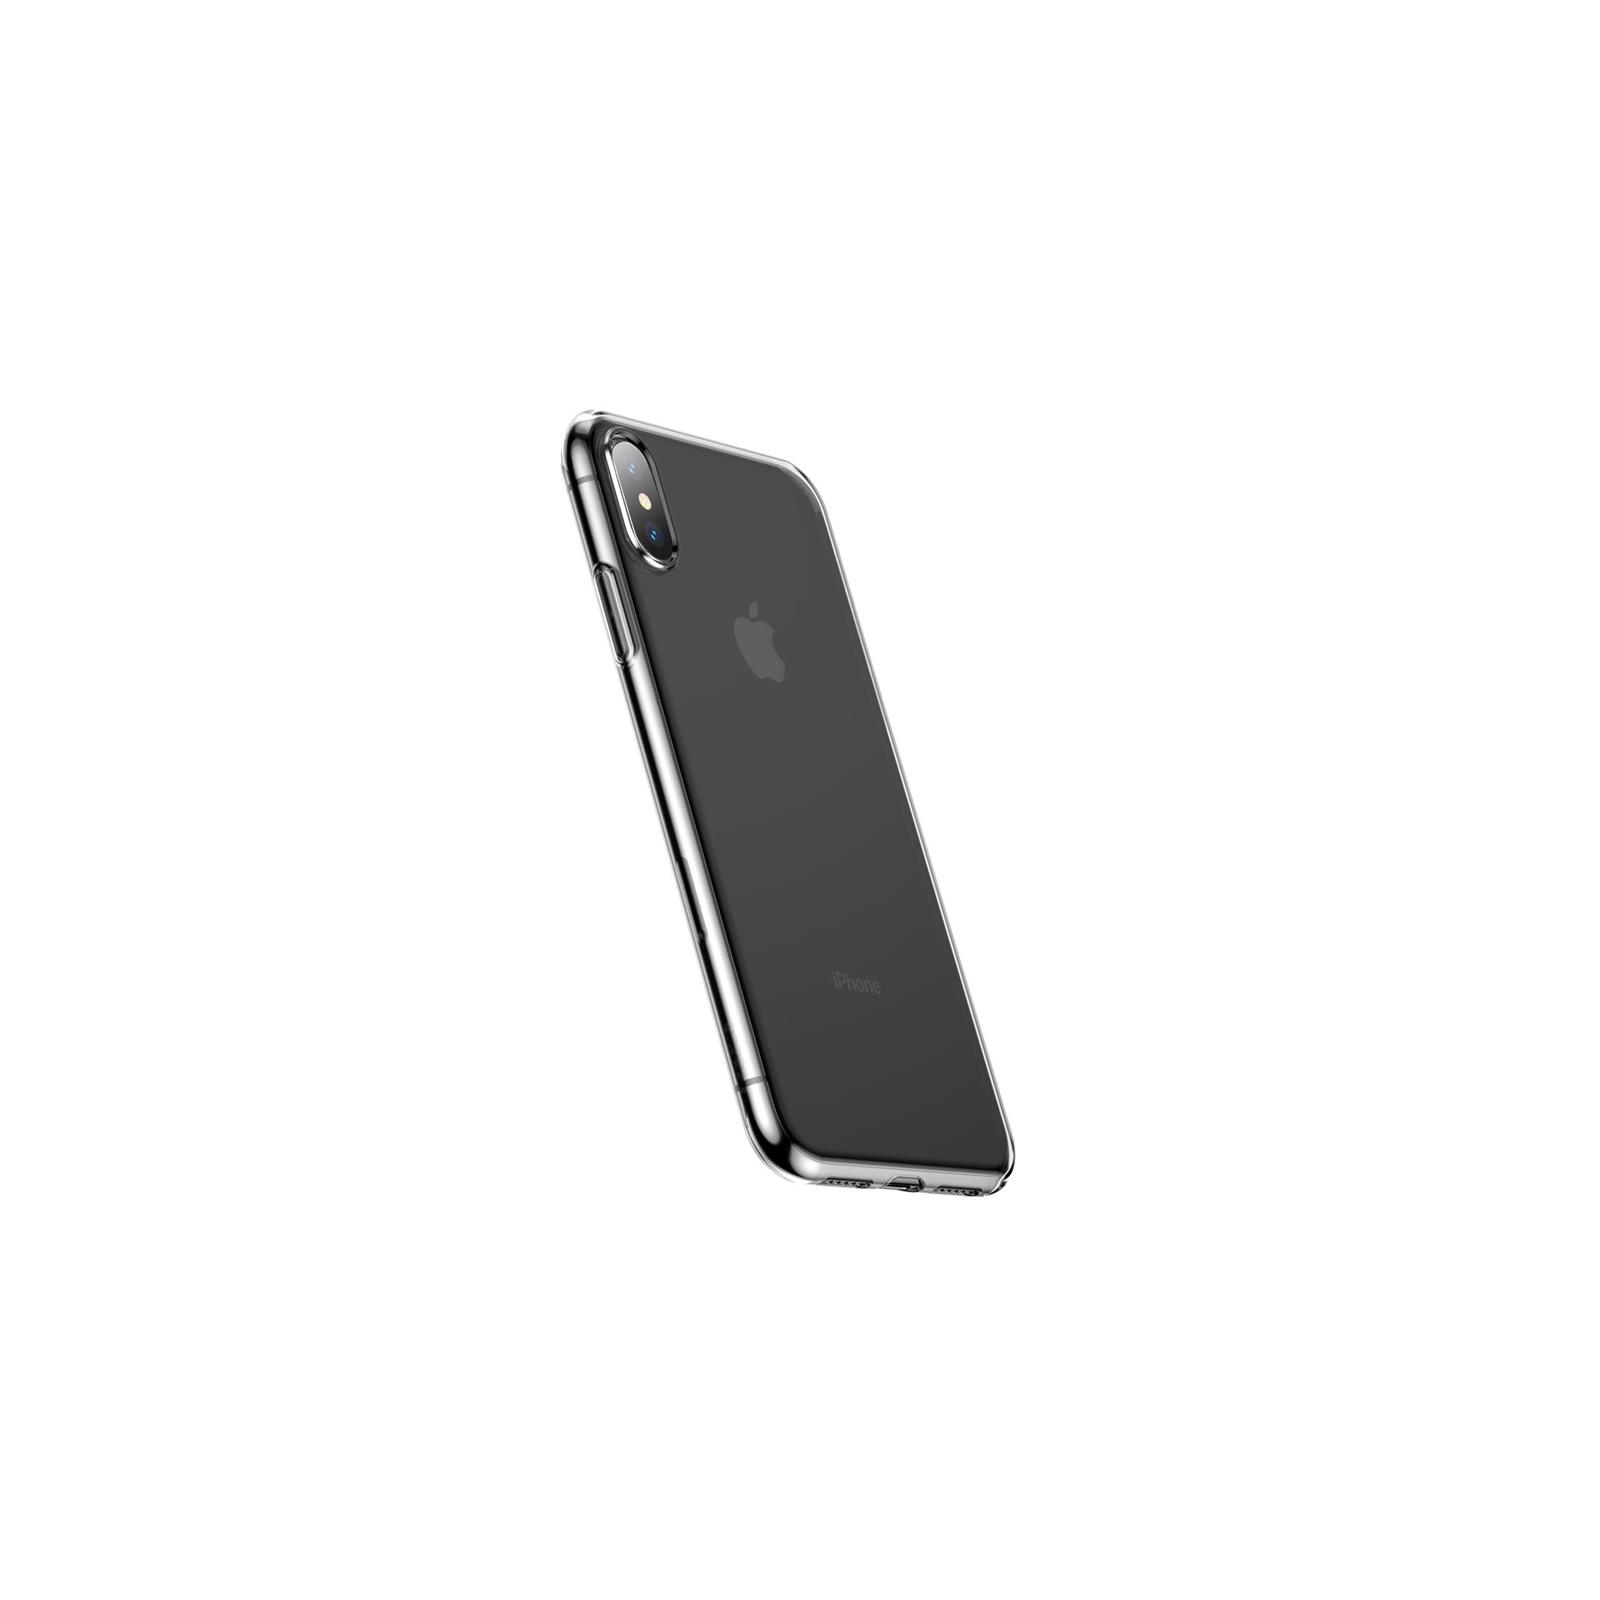 Чохол до моб. телефона Baseus iPhone XS Max Simplicity basic, TR (ARAPIPH65-B02) зображення 2